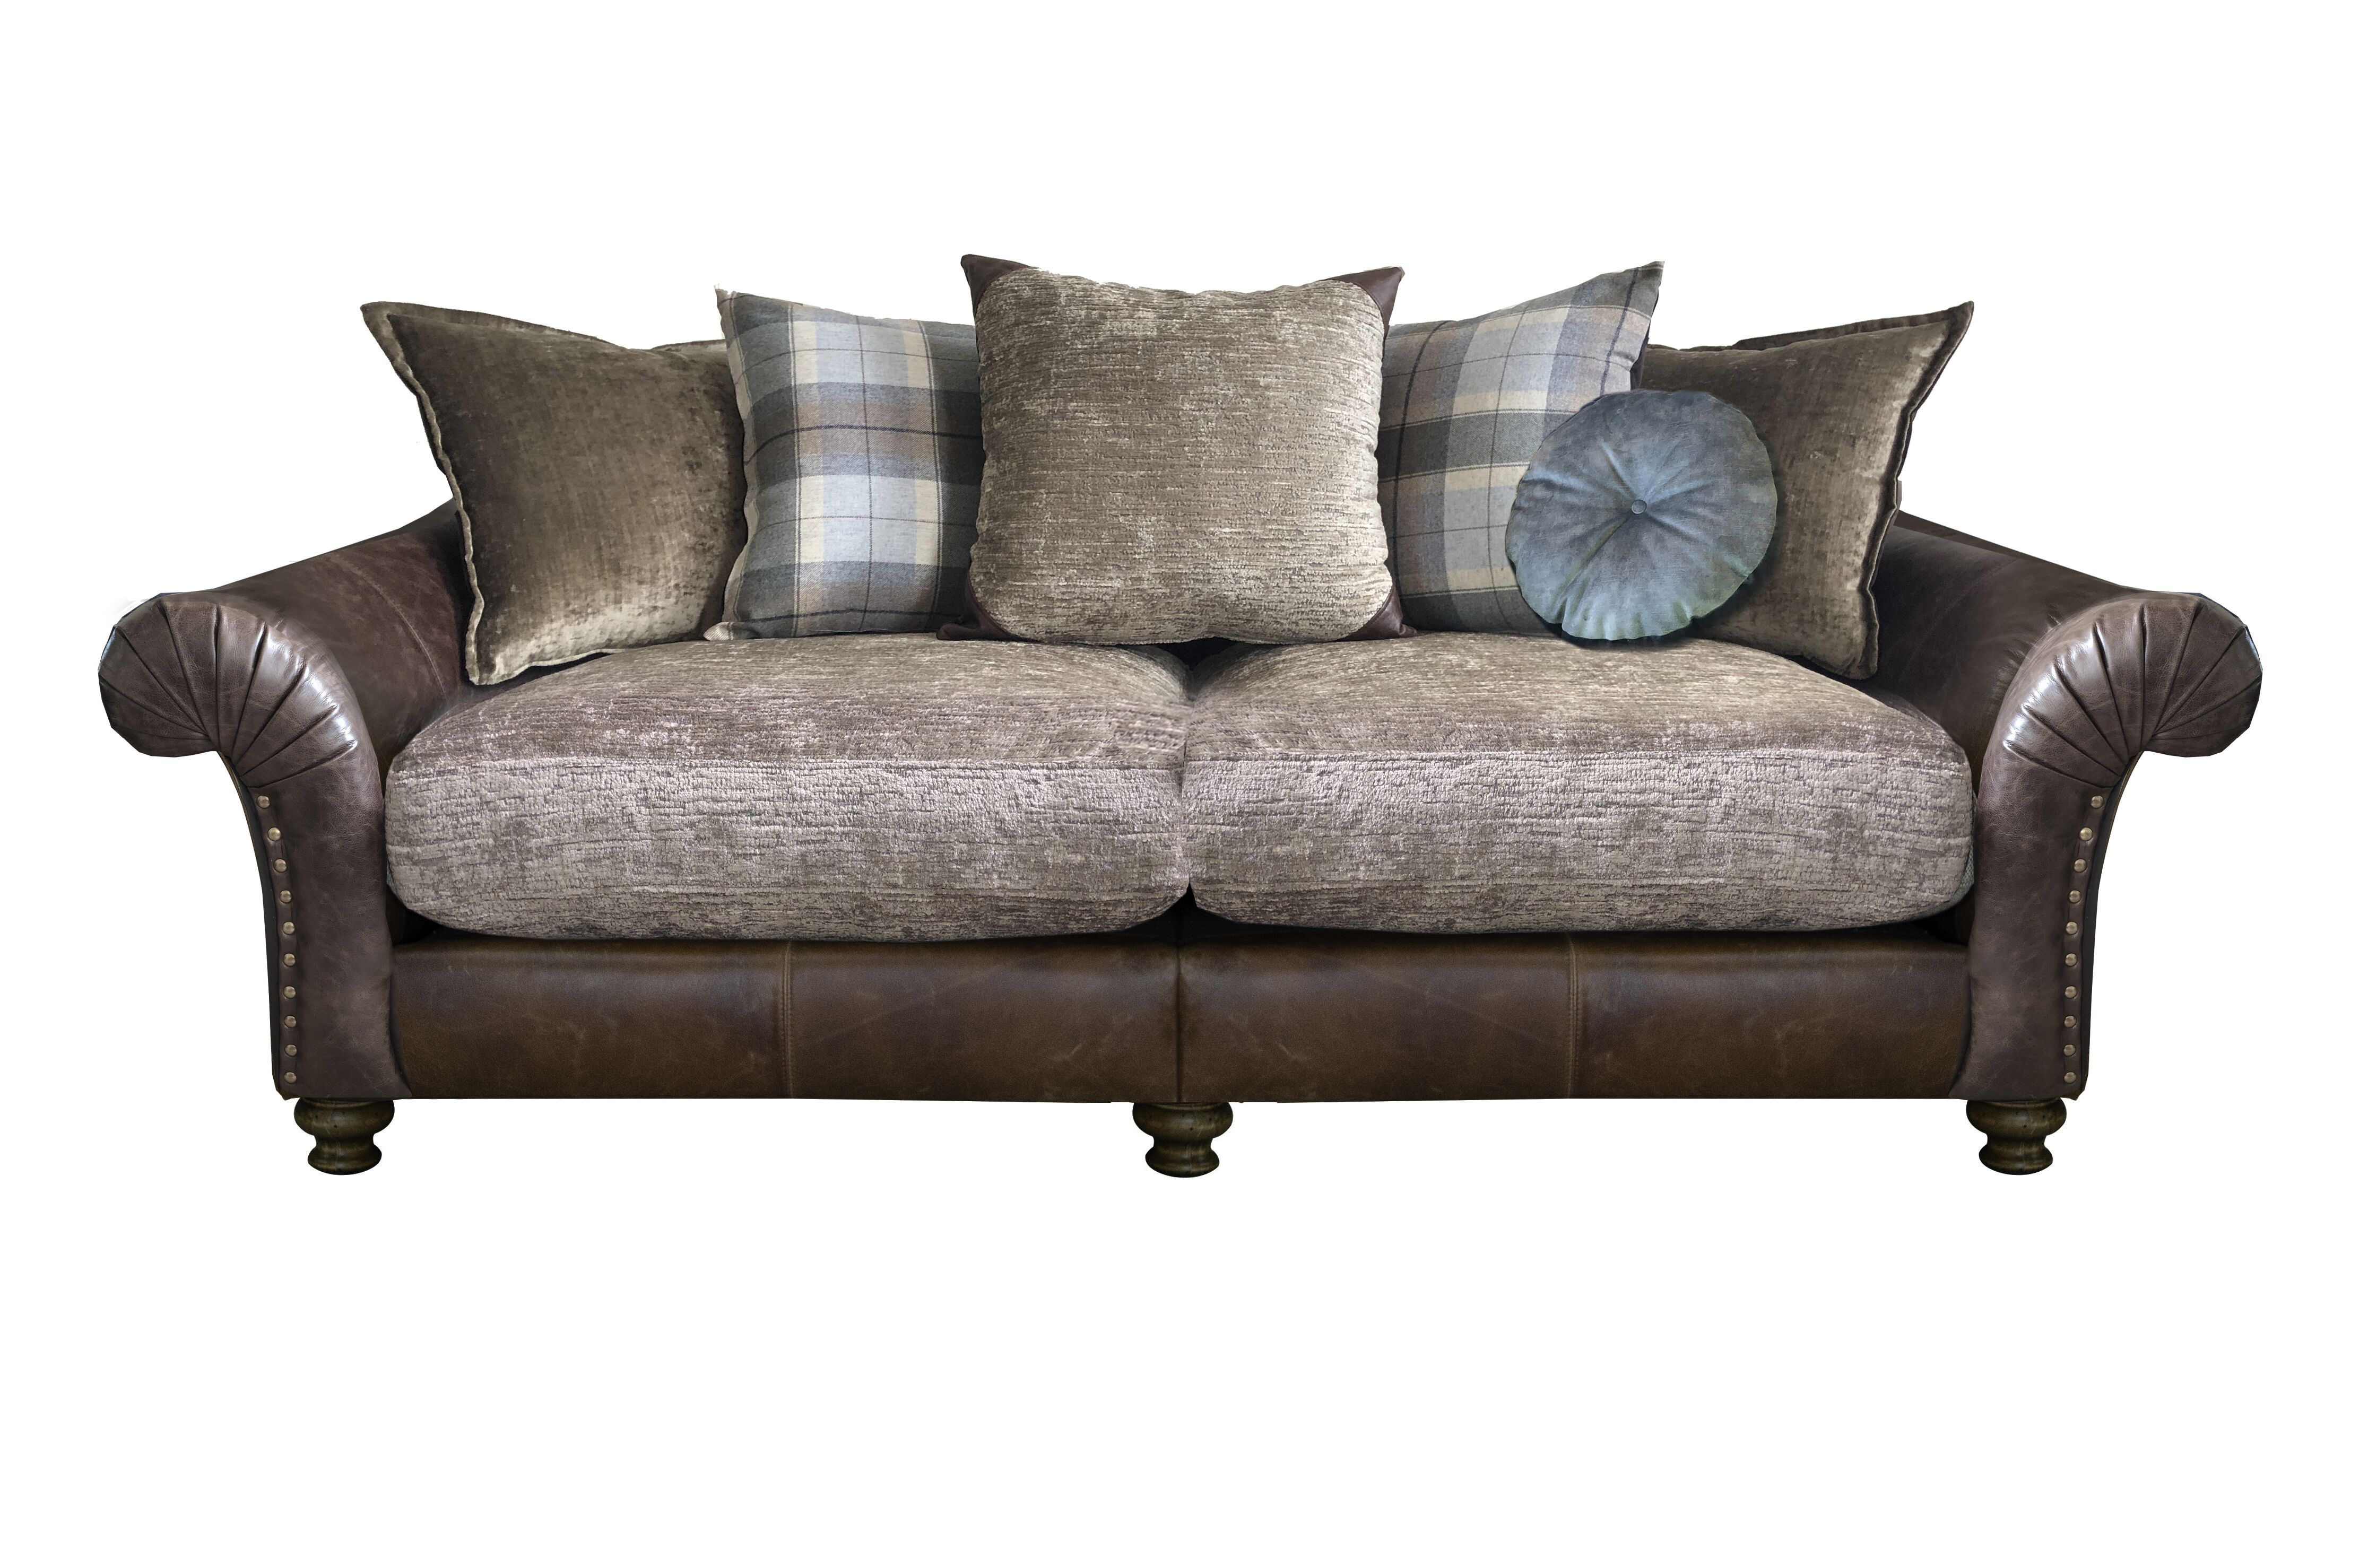 Grayson 4 Seater Sofa